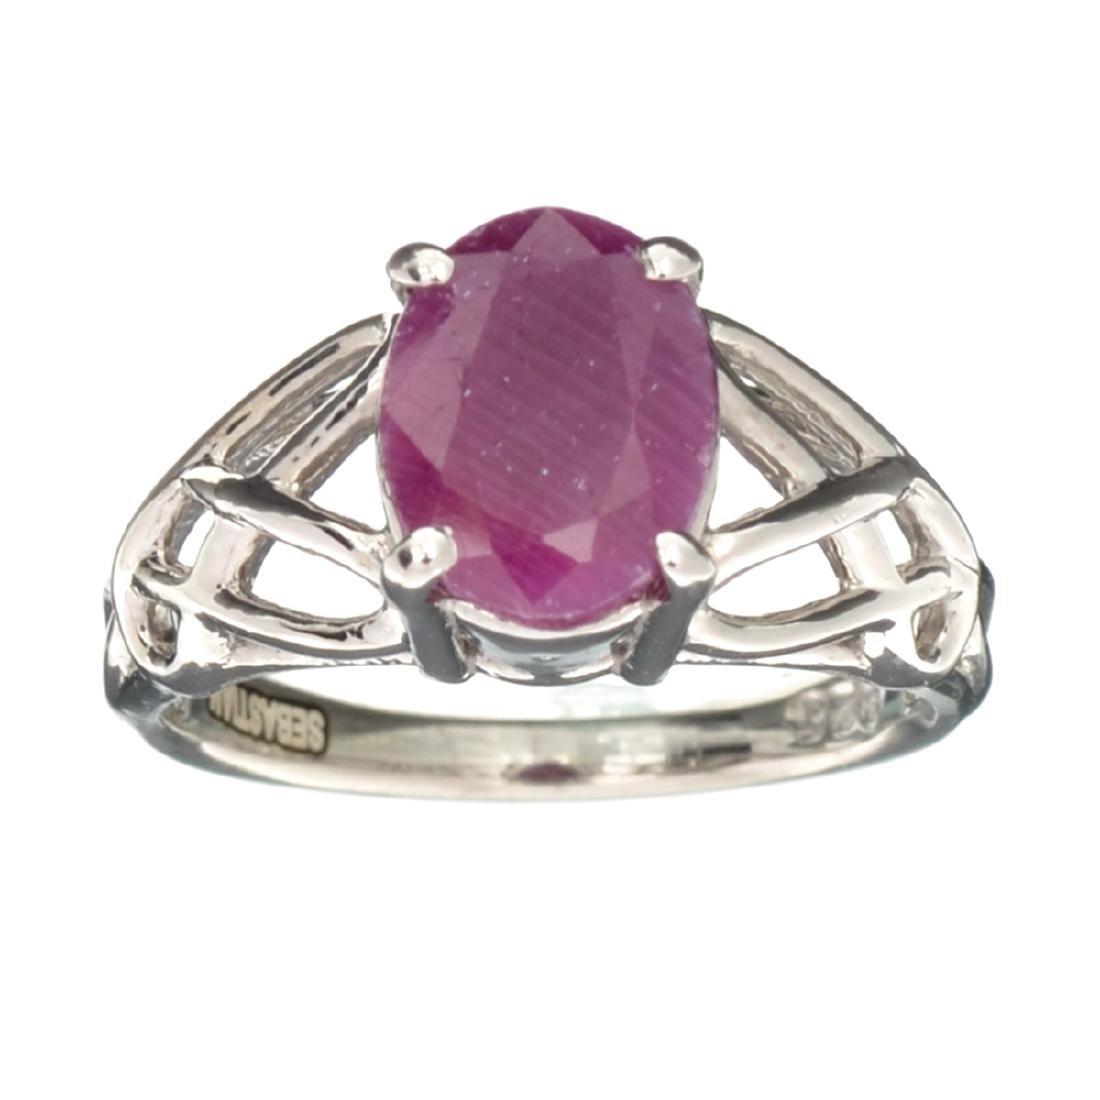 APP: 0.5k Fine Jewelry Designer Sebastian, 1.59CT Oval